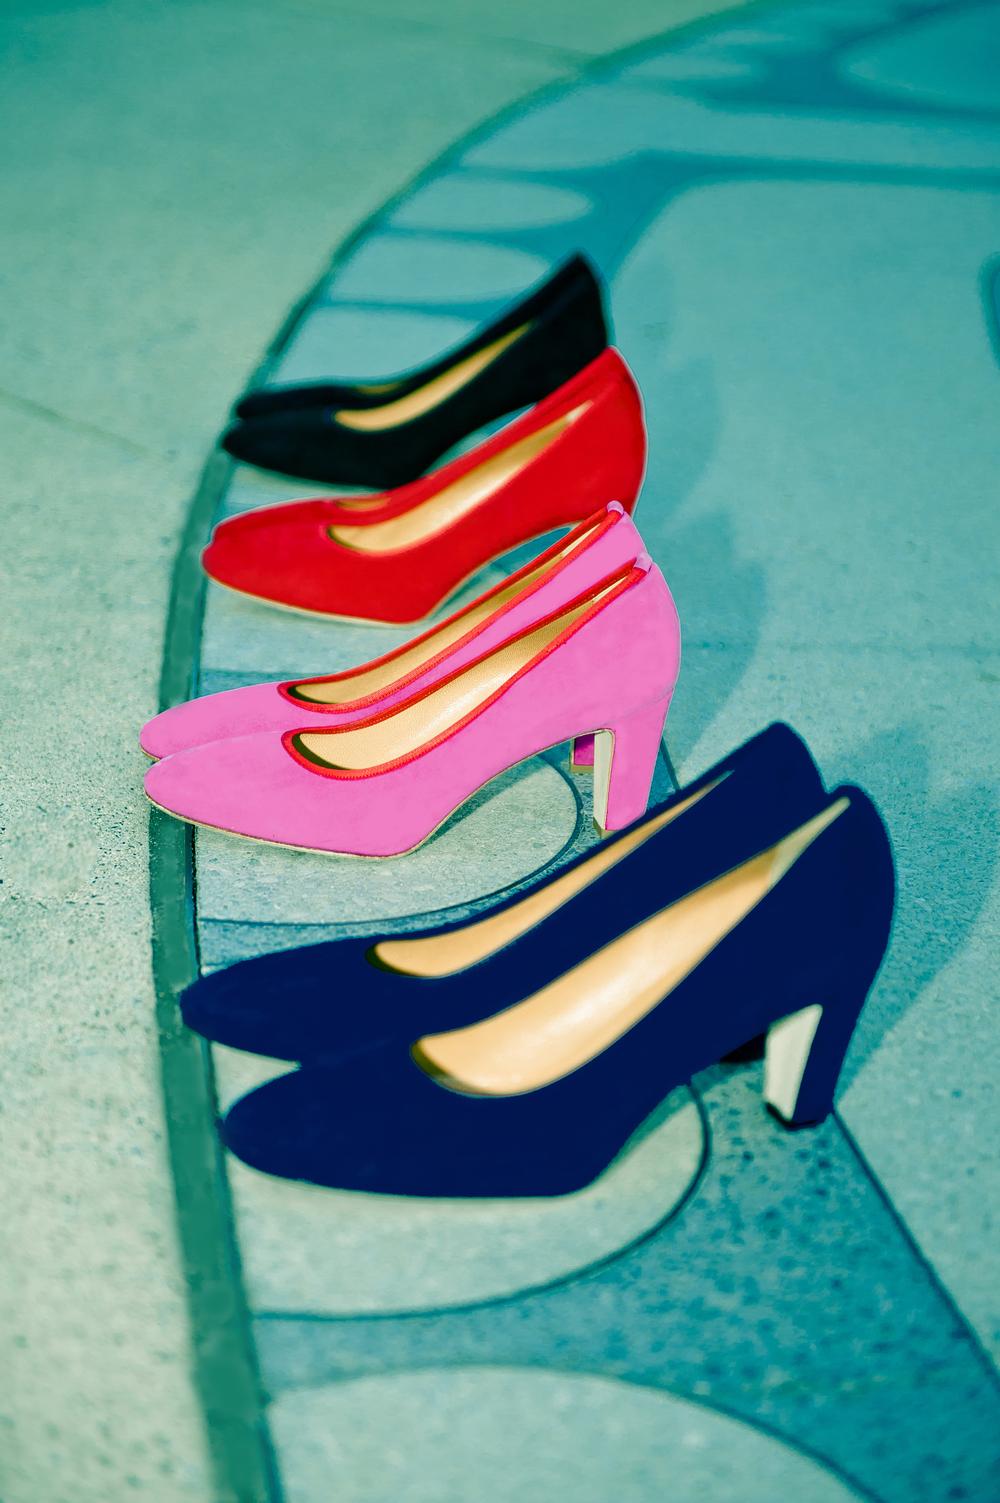 LLXLLQ shoes MAI